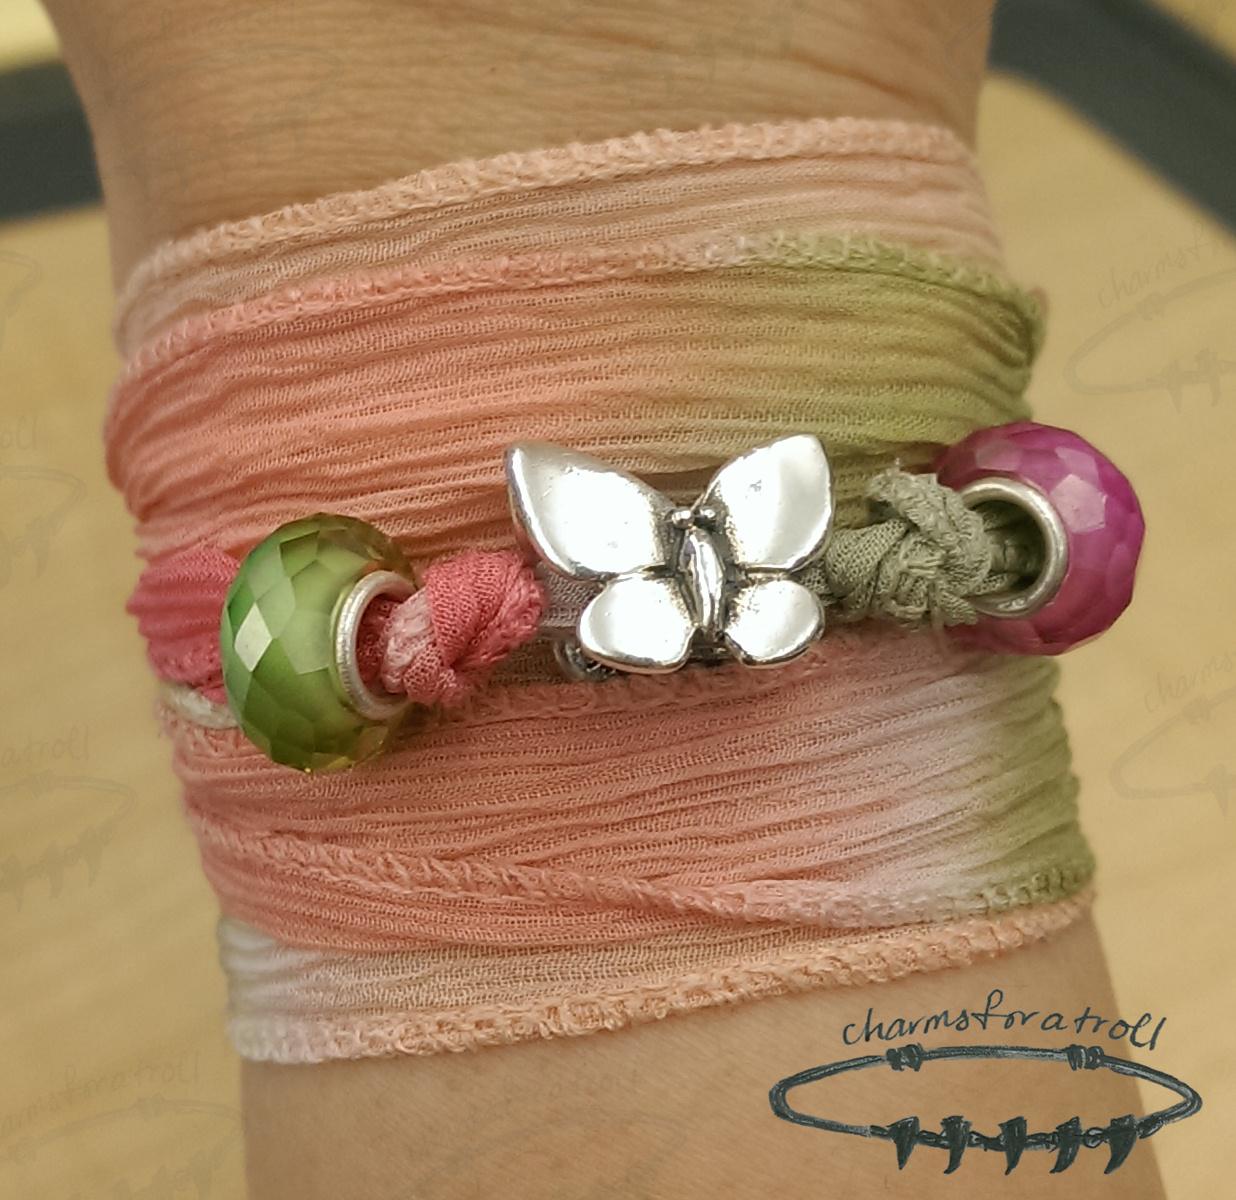 Trollbeads Fantasy Butterfly, Novobeads Wild Rose Silk Wrap, Novobeads Key Lime Mini CZ, Novobeads Pink Lemonade Mini CZ